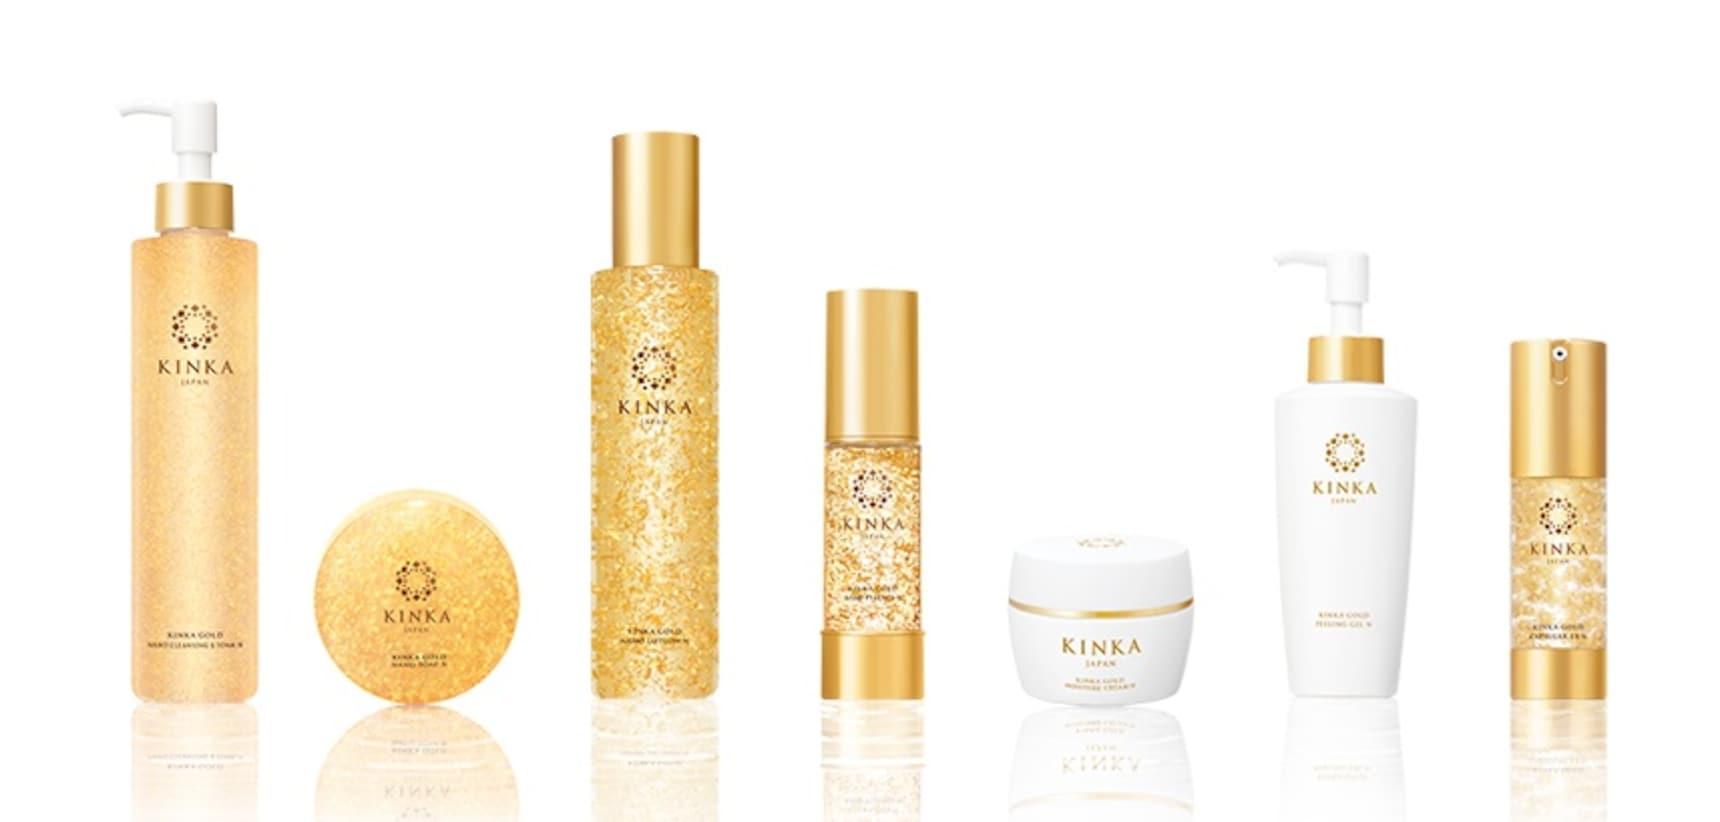 Top 5 Gold Cosmetics from Kanazawa